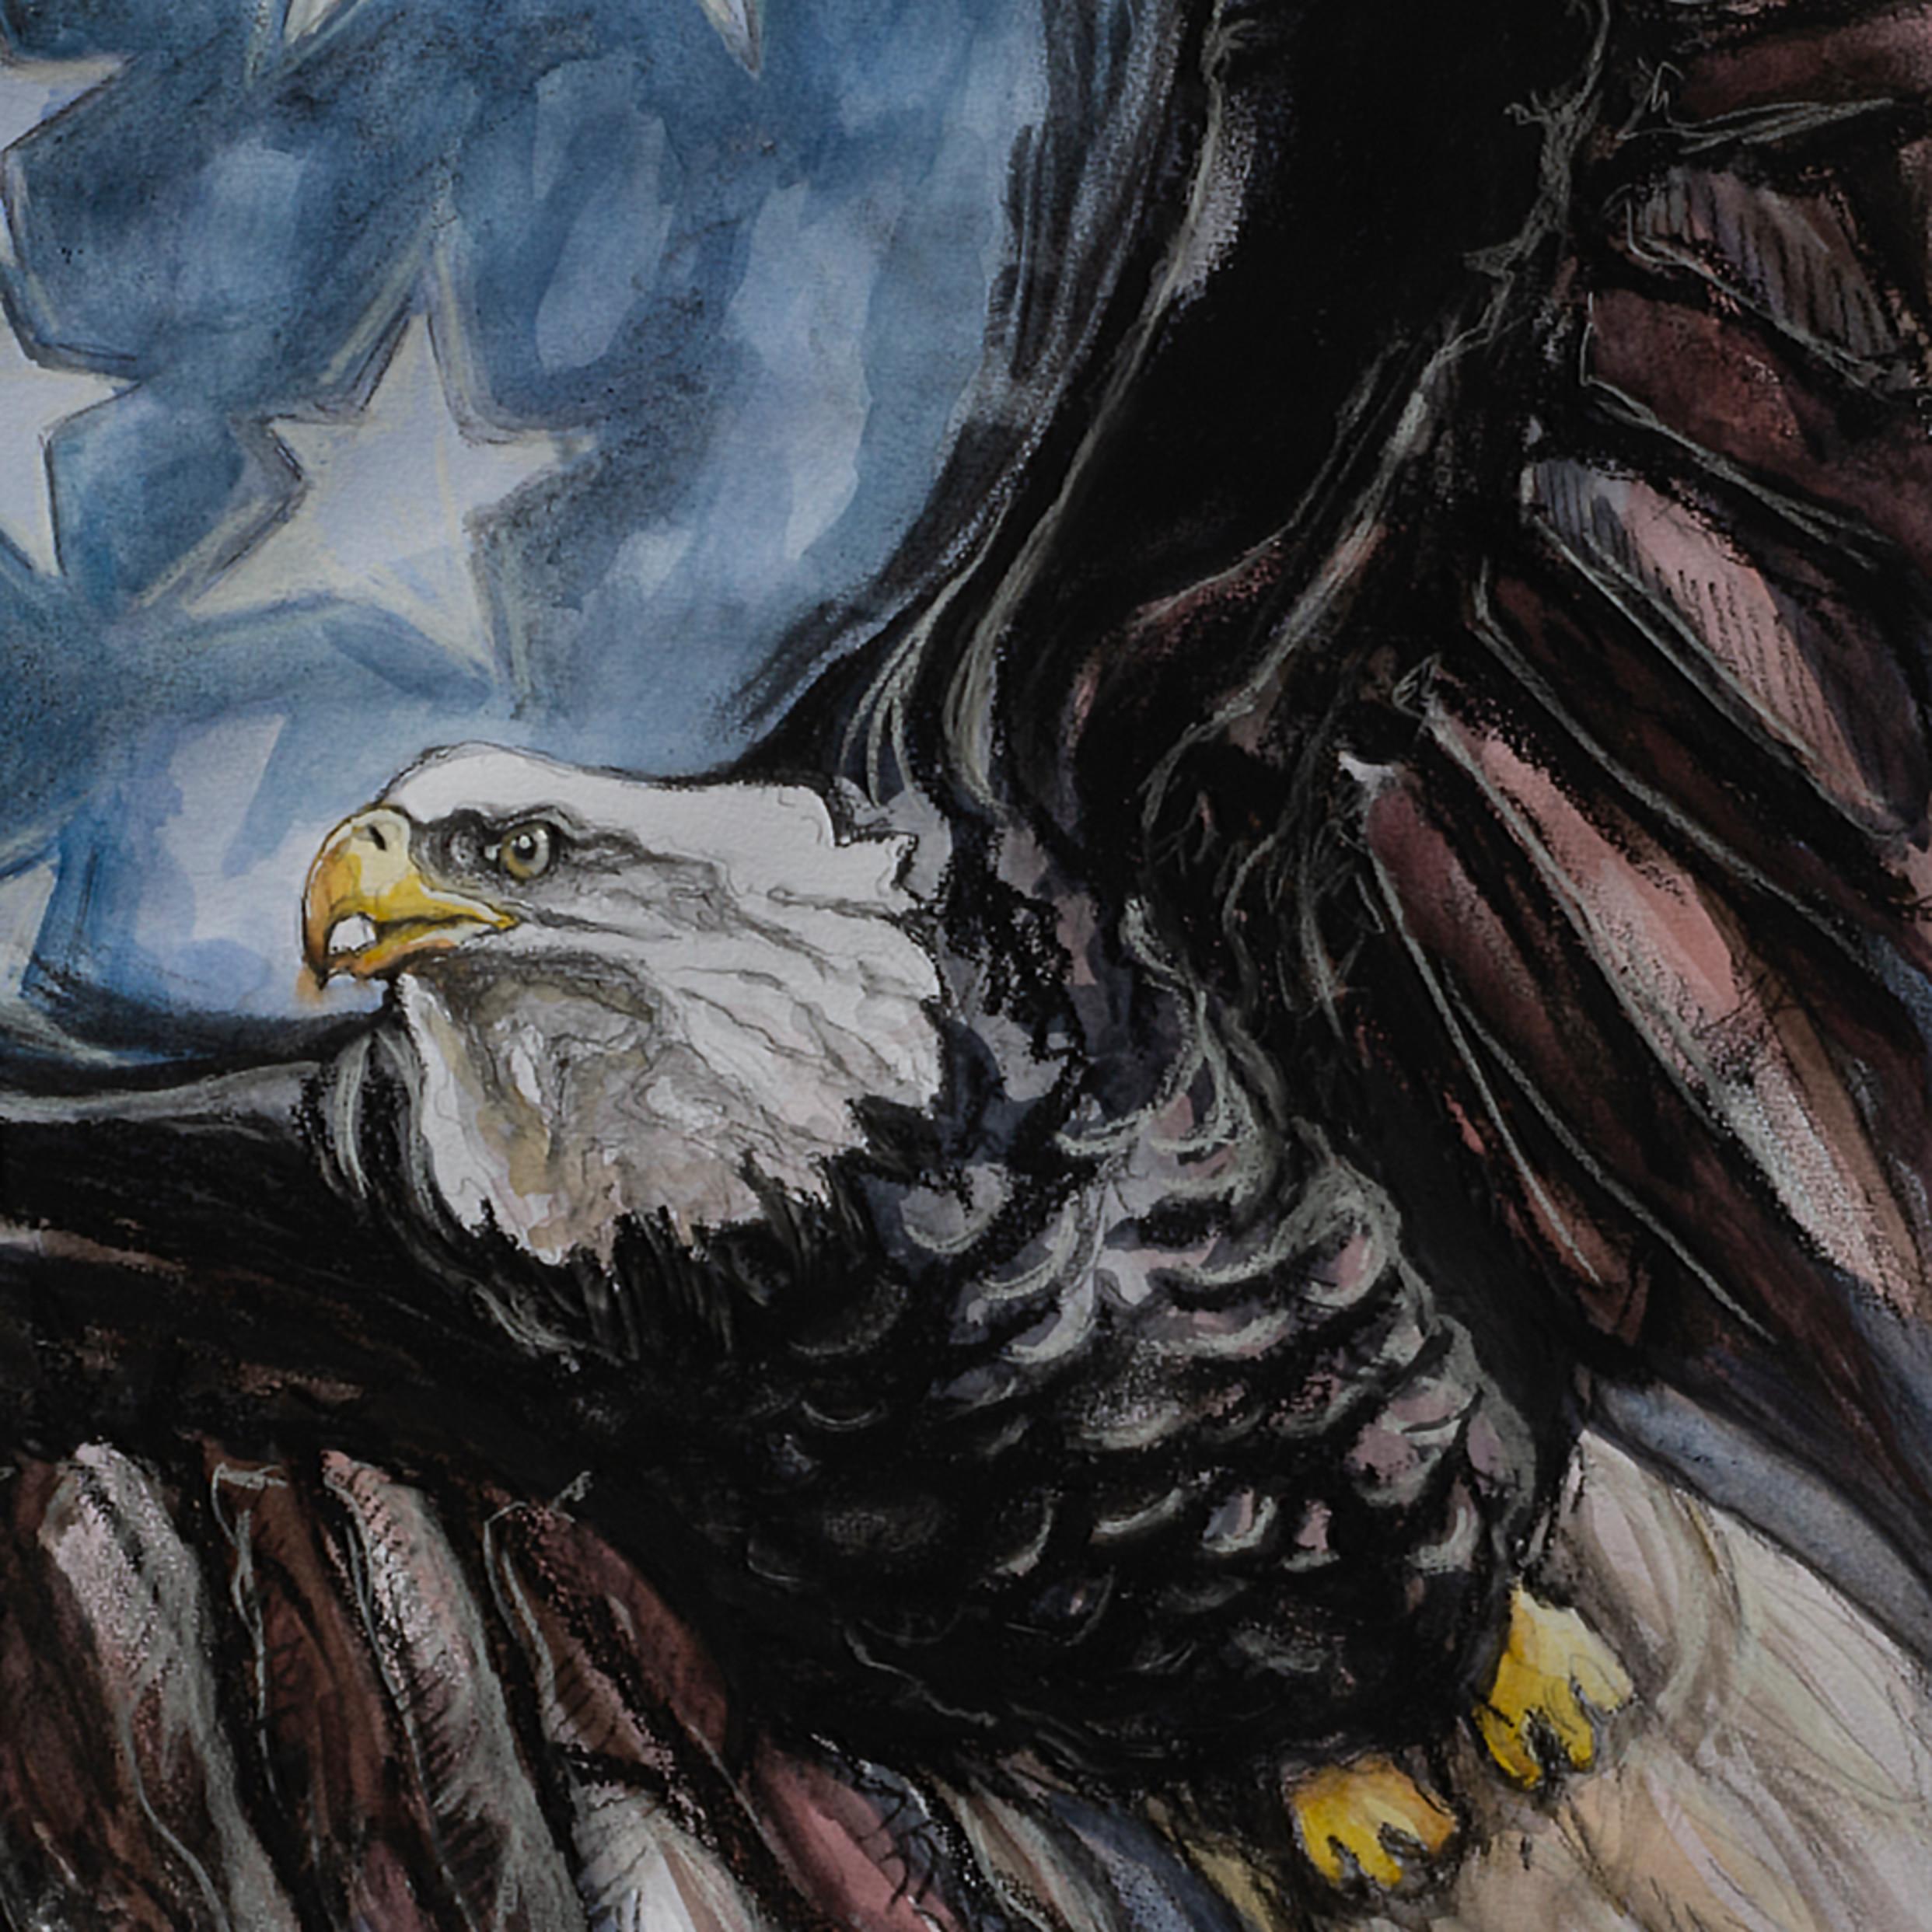 Freedom zmjhcb